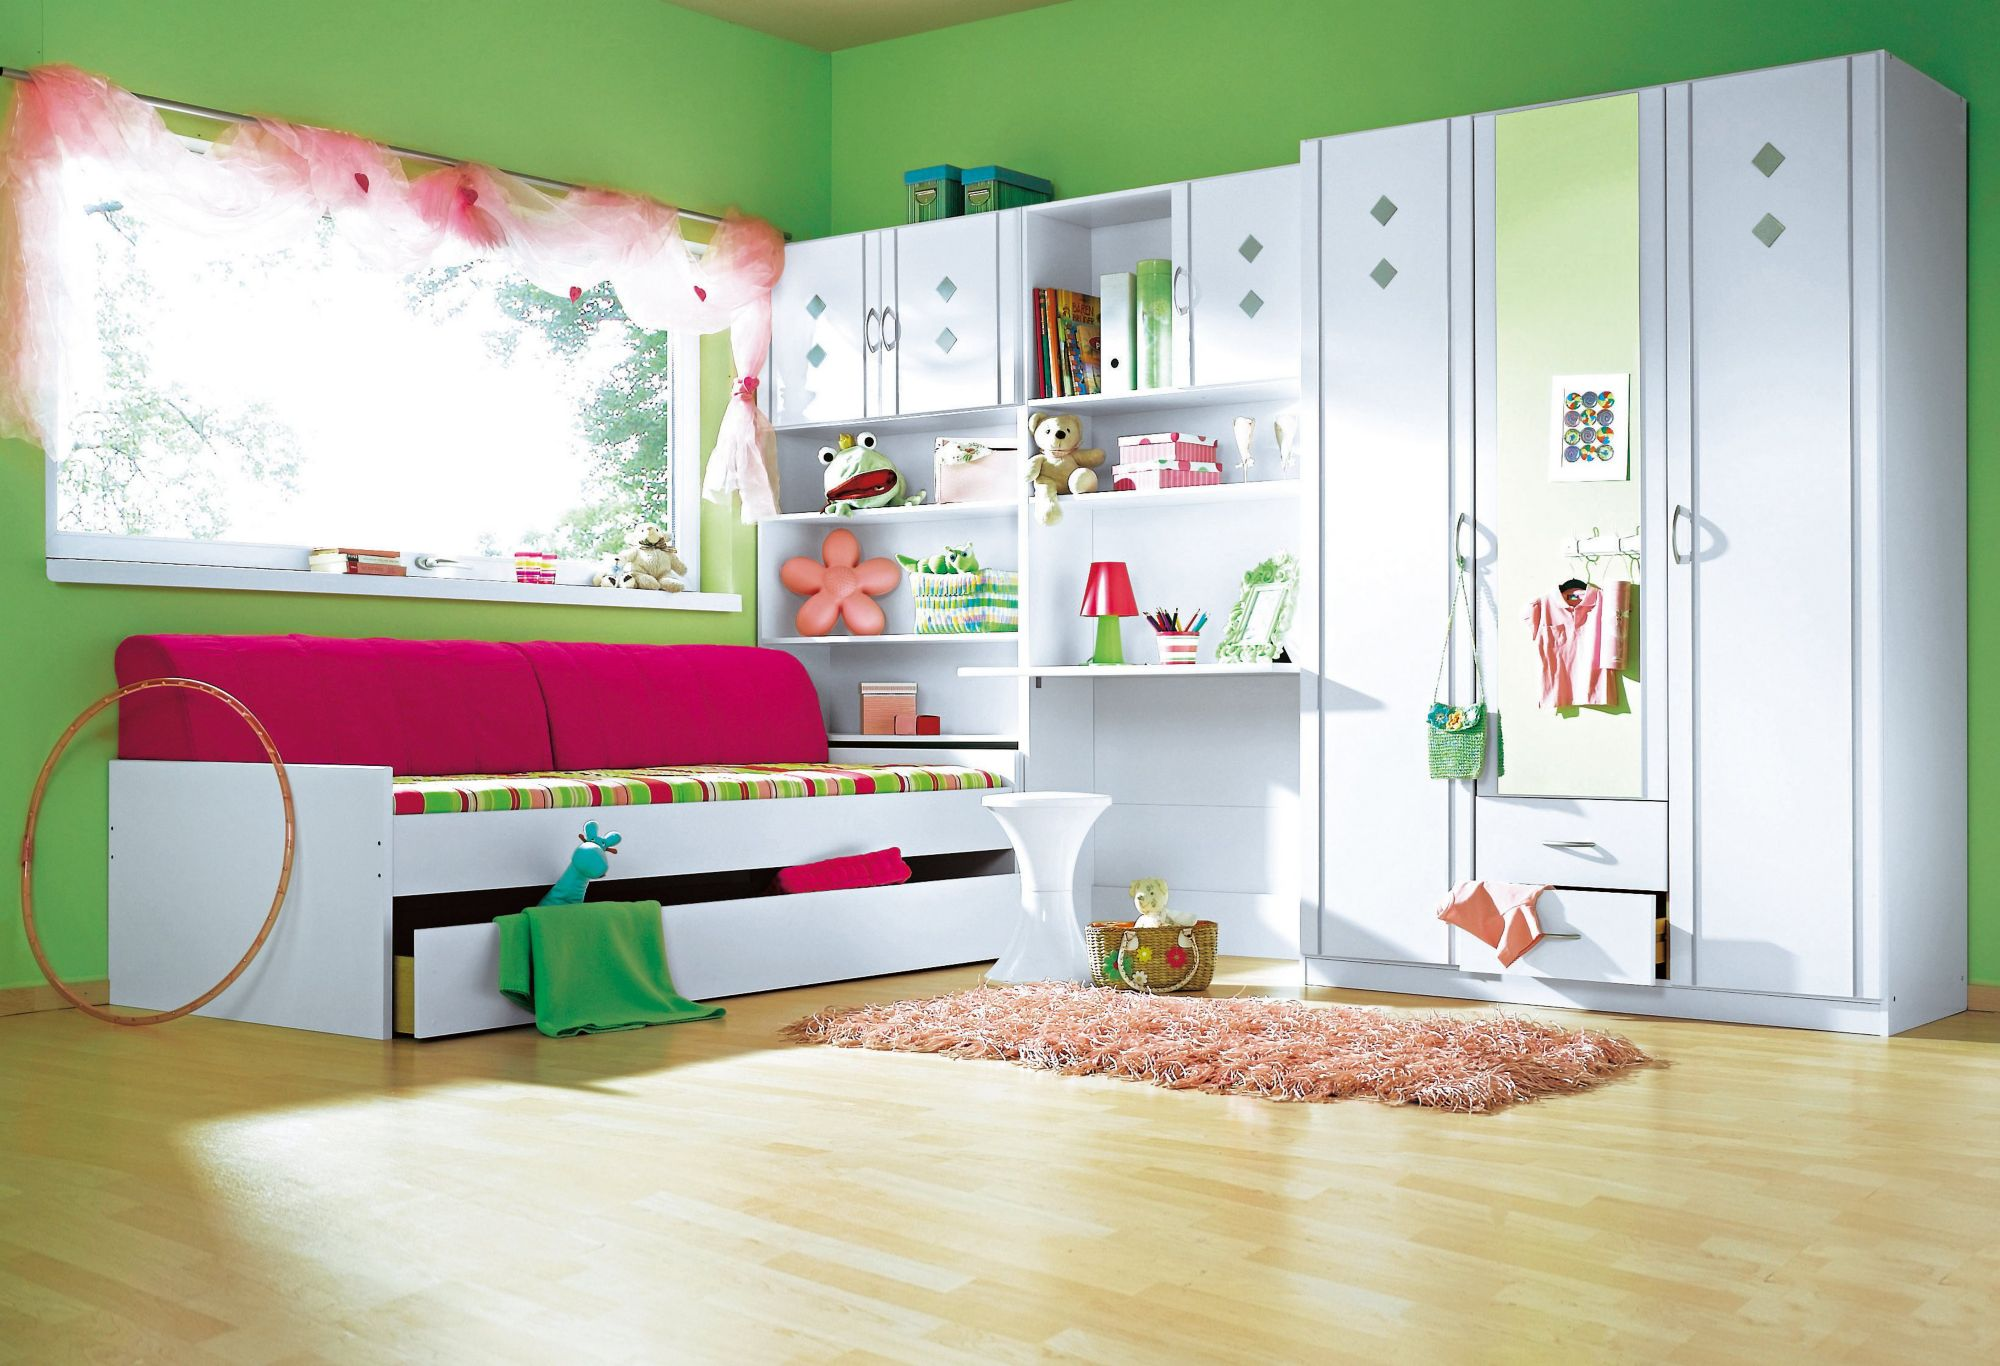 rauch jugendzimmer set 4 tlg schwab versand. Black Bedroom Furniture Sets. Home Design Ideas